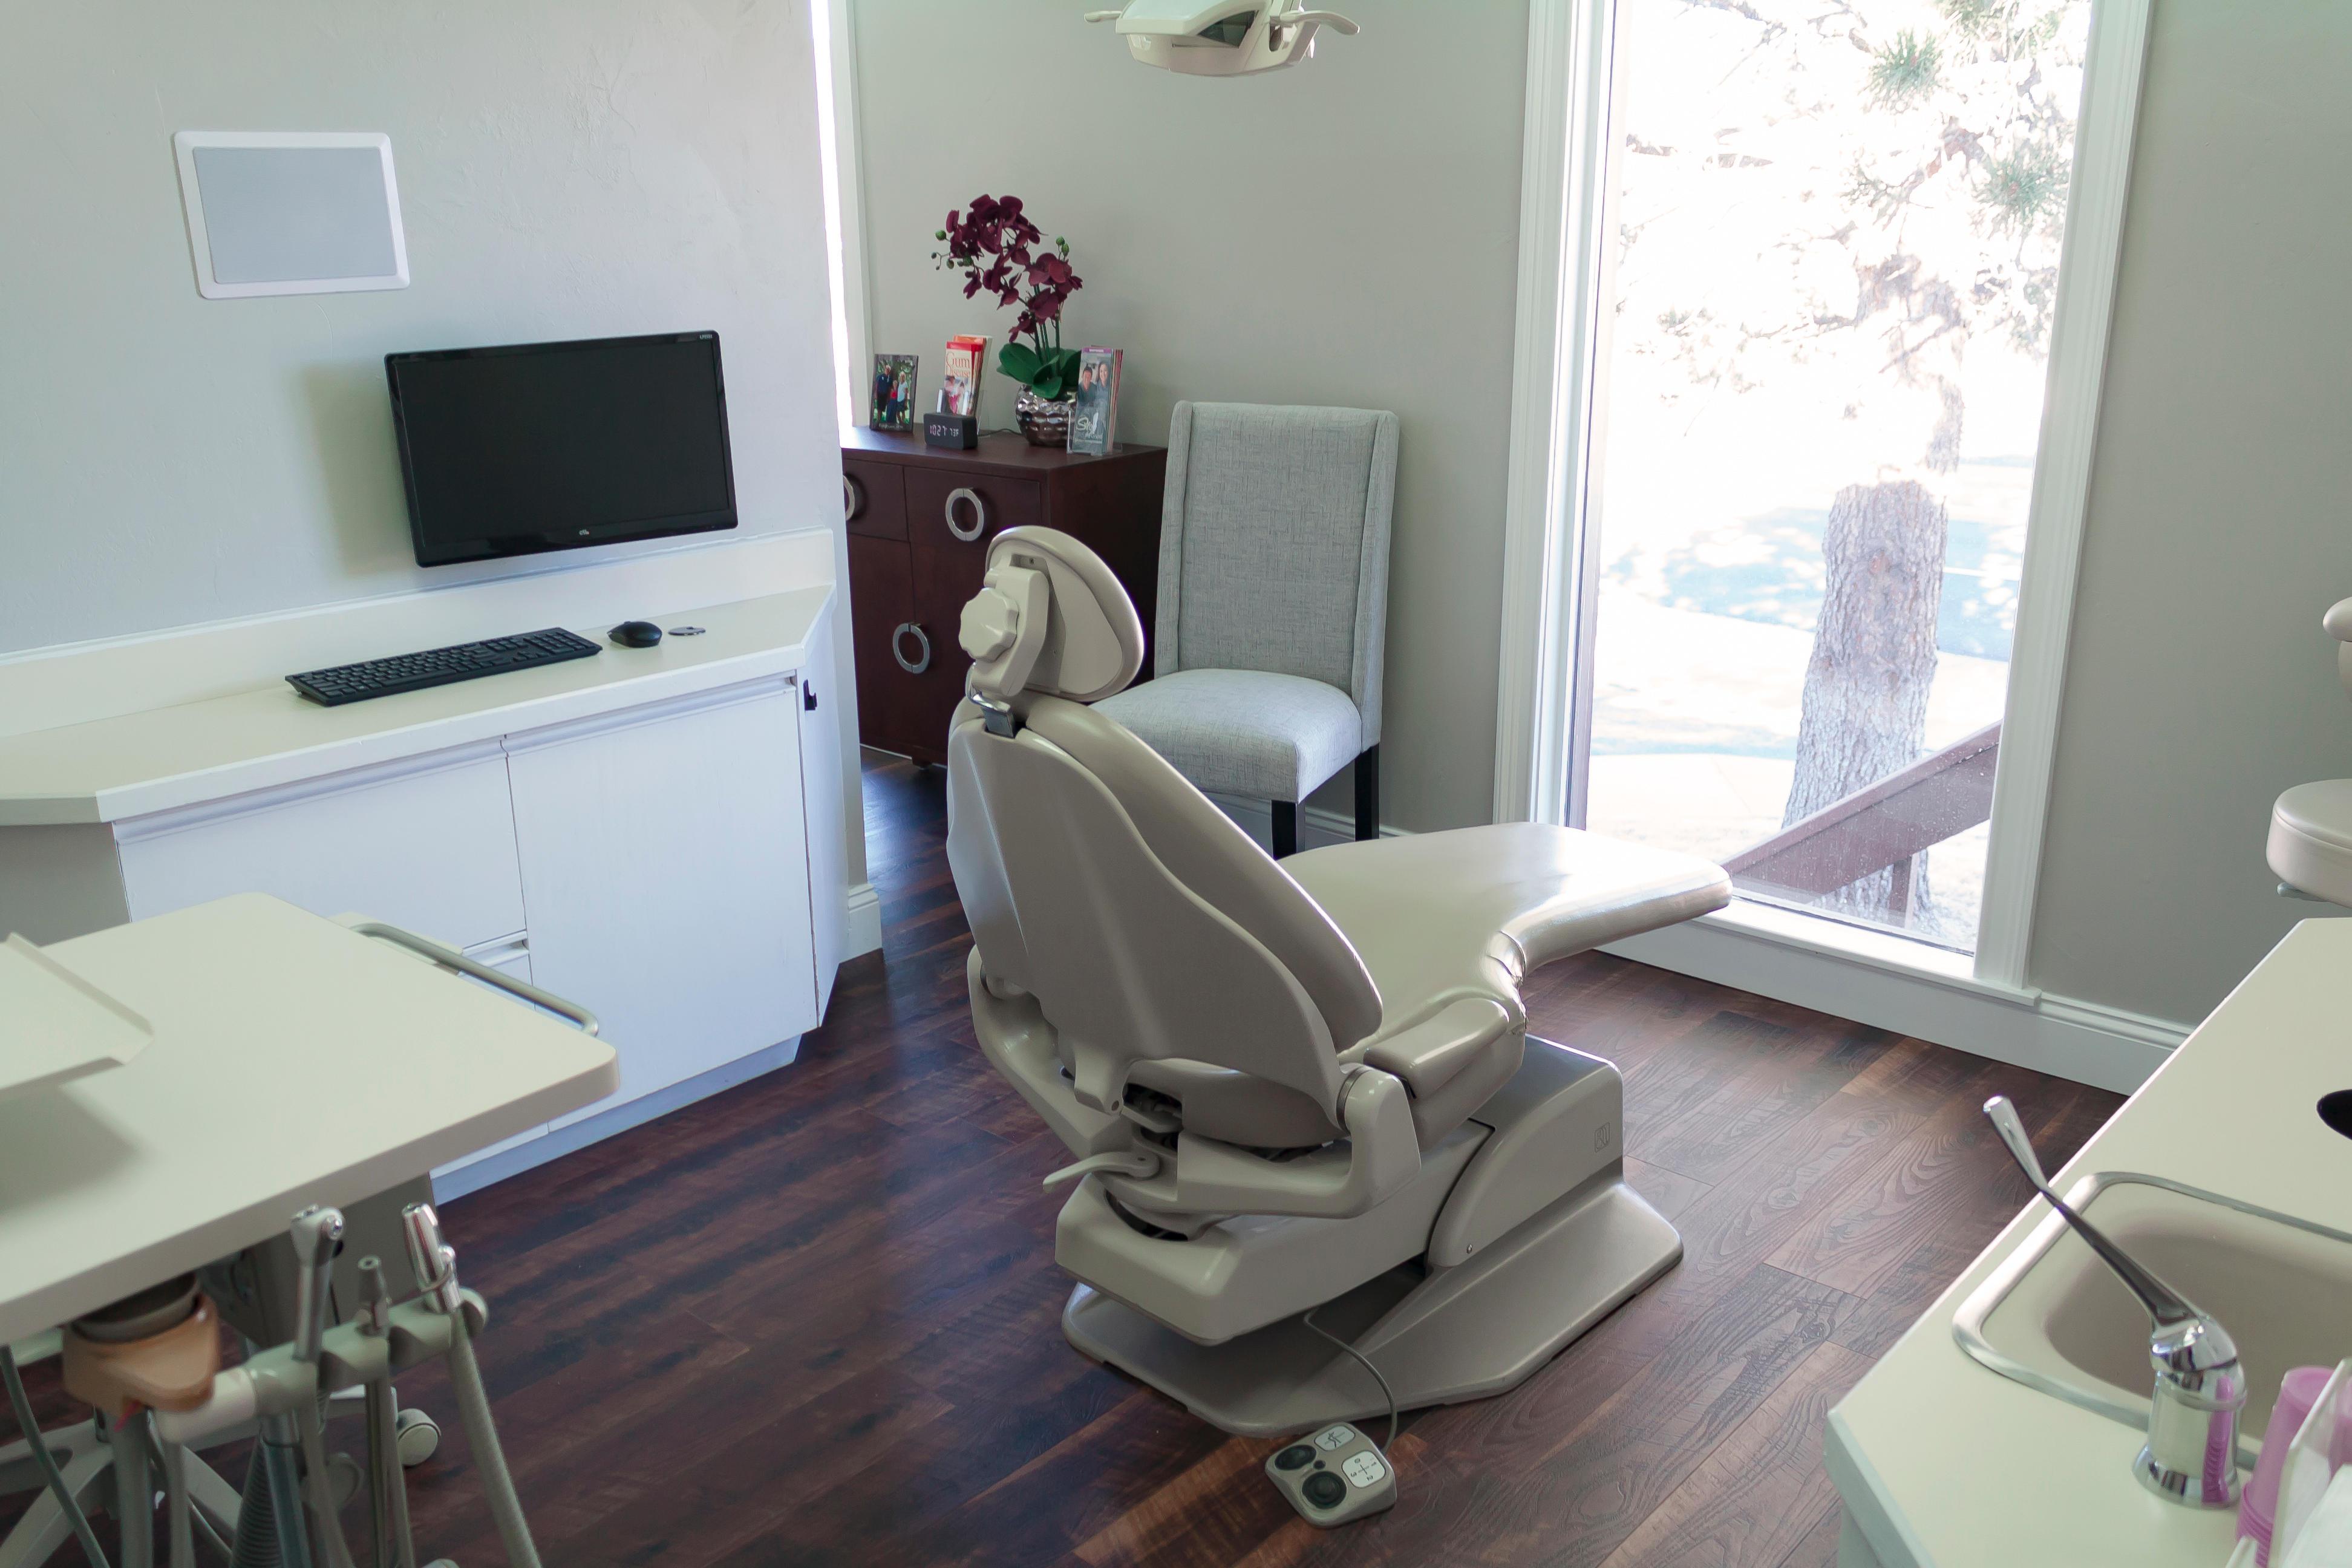 Streeter Dental